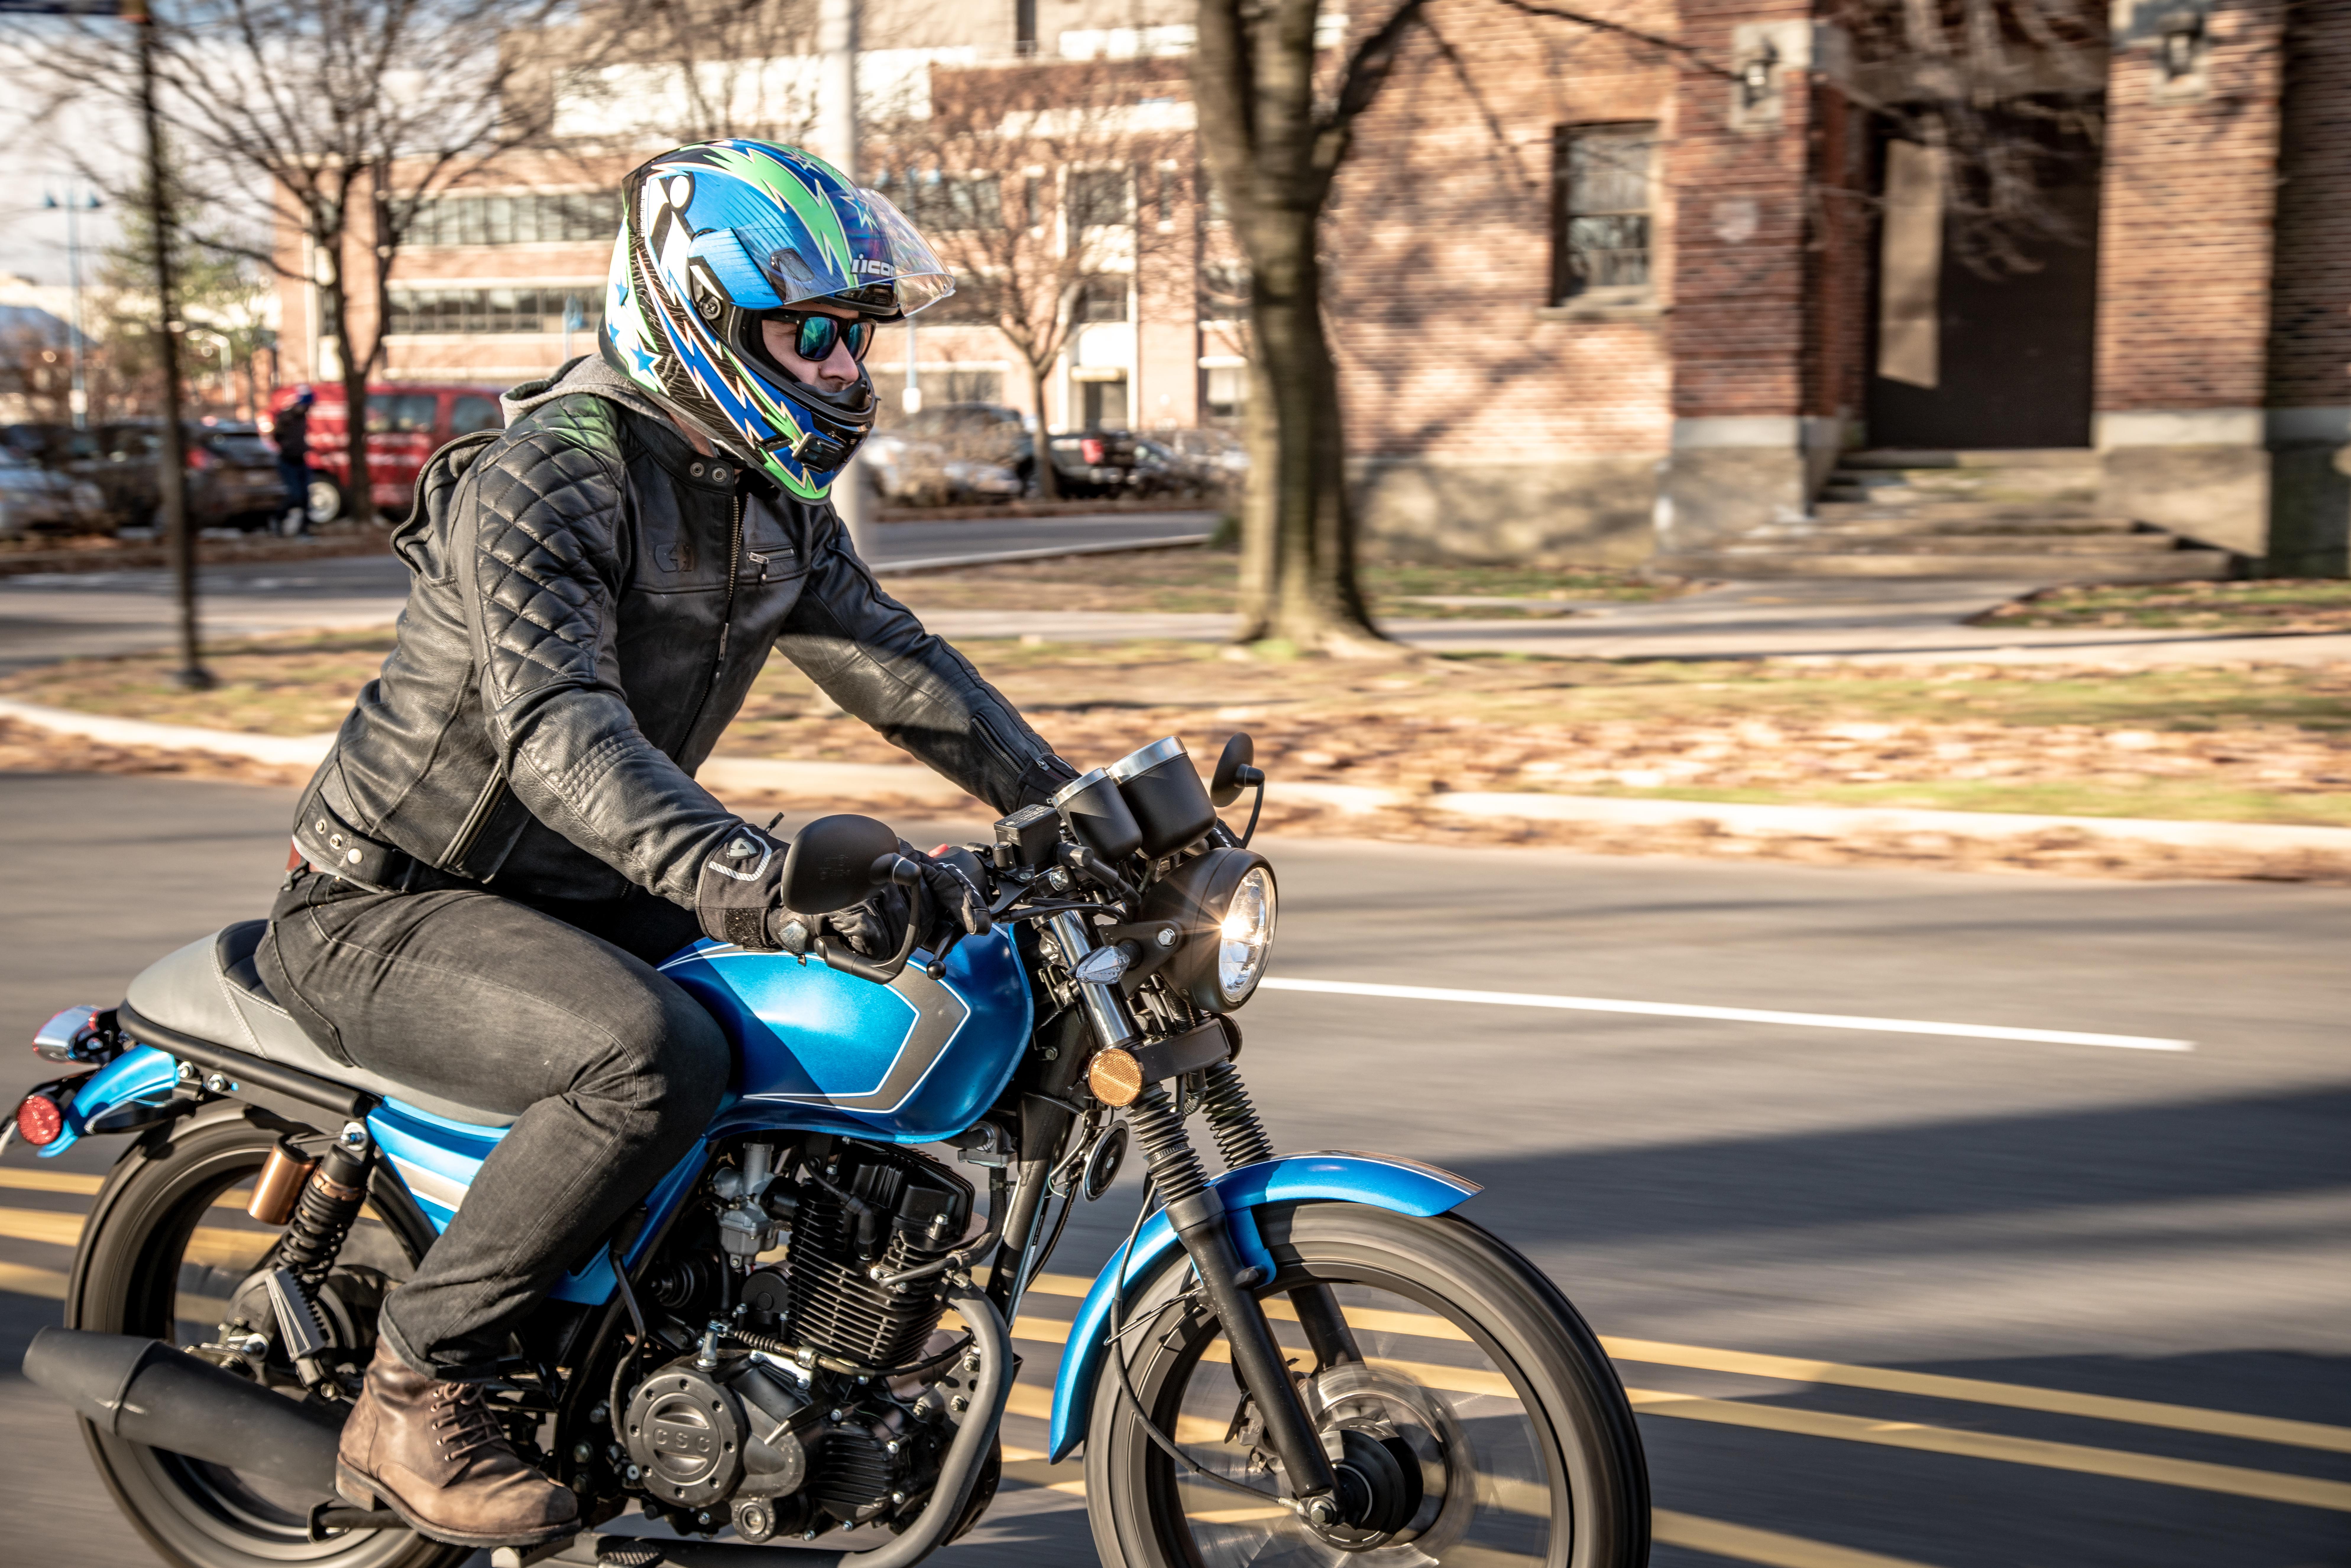 2018 CSC SG250 San Gabriel first ride review - RevZilla